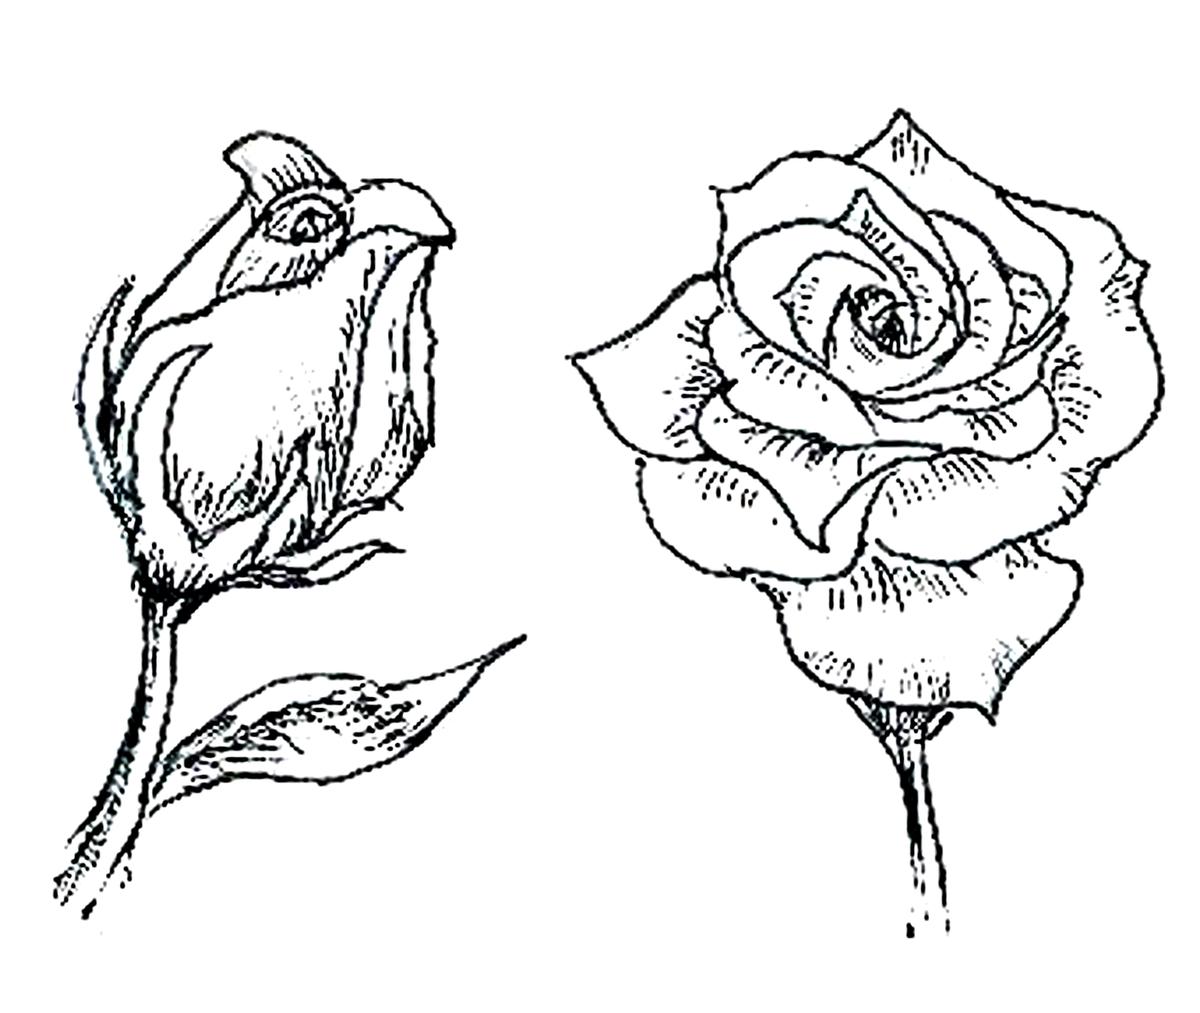 таком распускающийся цветок картинки карандашом белого цвета